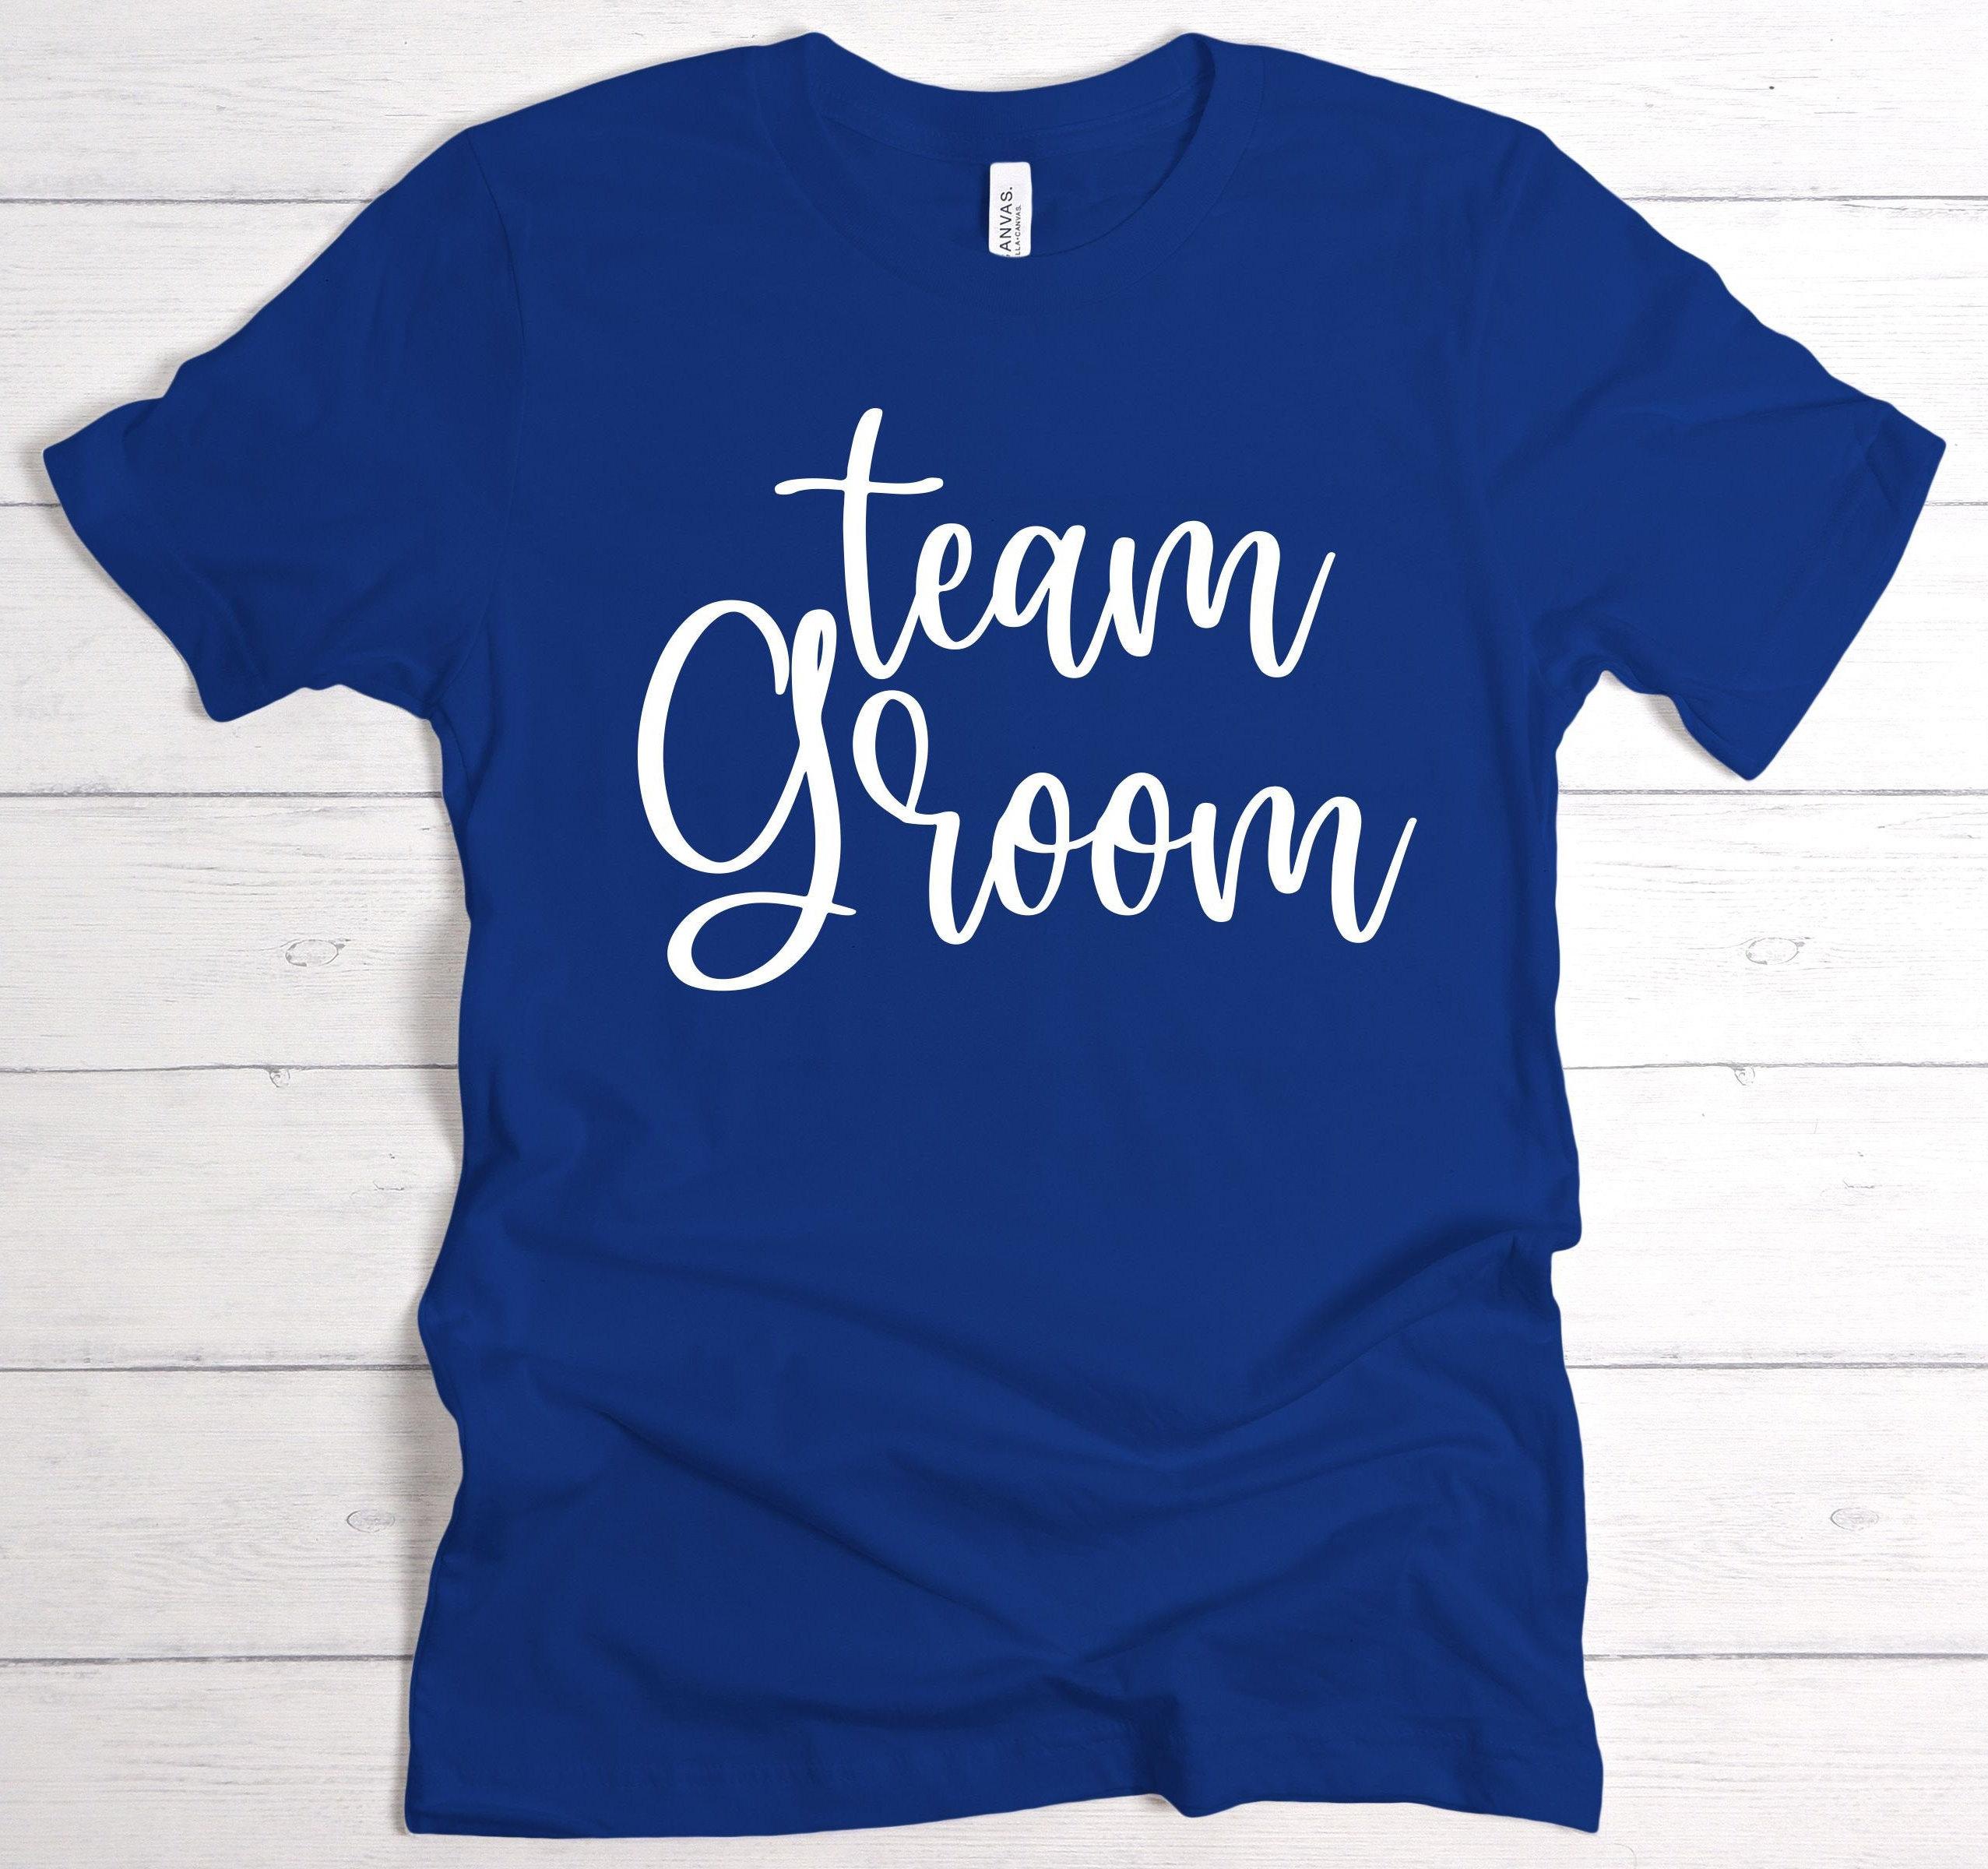 Team-groom-svg-groomsmen-svg-bride-svg-bachelor-party-svg-bride-svg-wedding-svg-design-bachelorette-svg-design-bridesmaid-cricut-svg-600a14c0